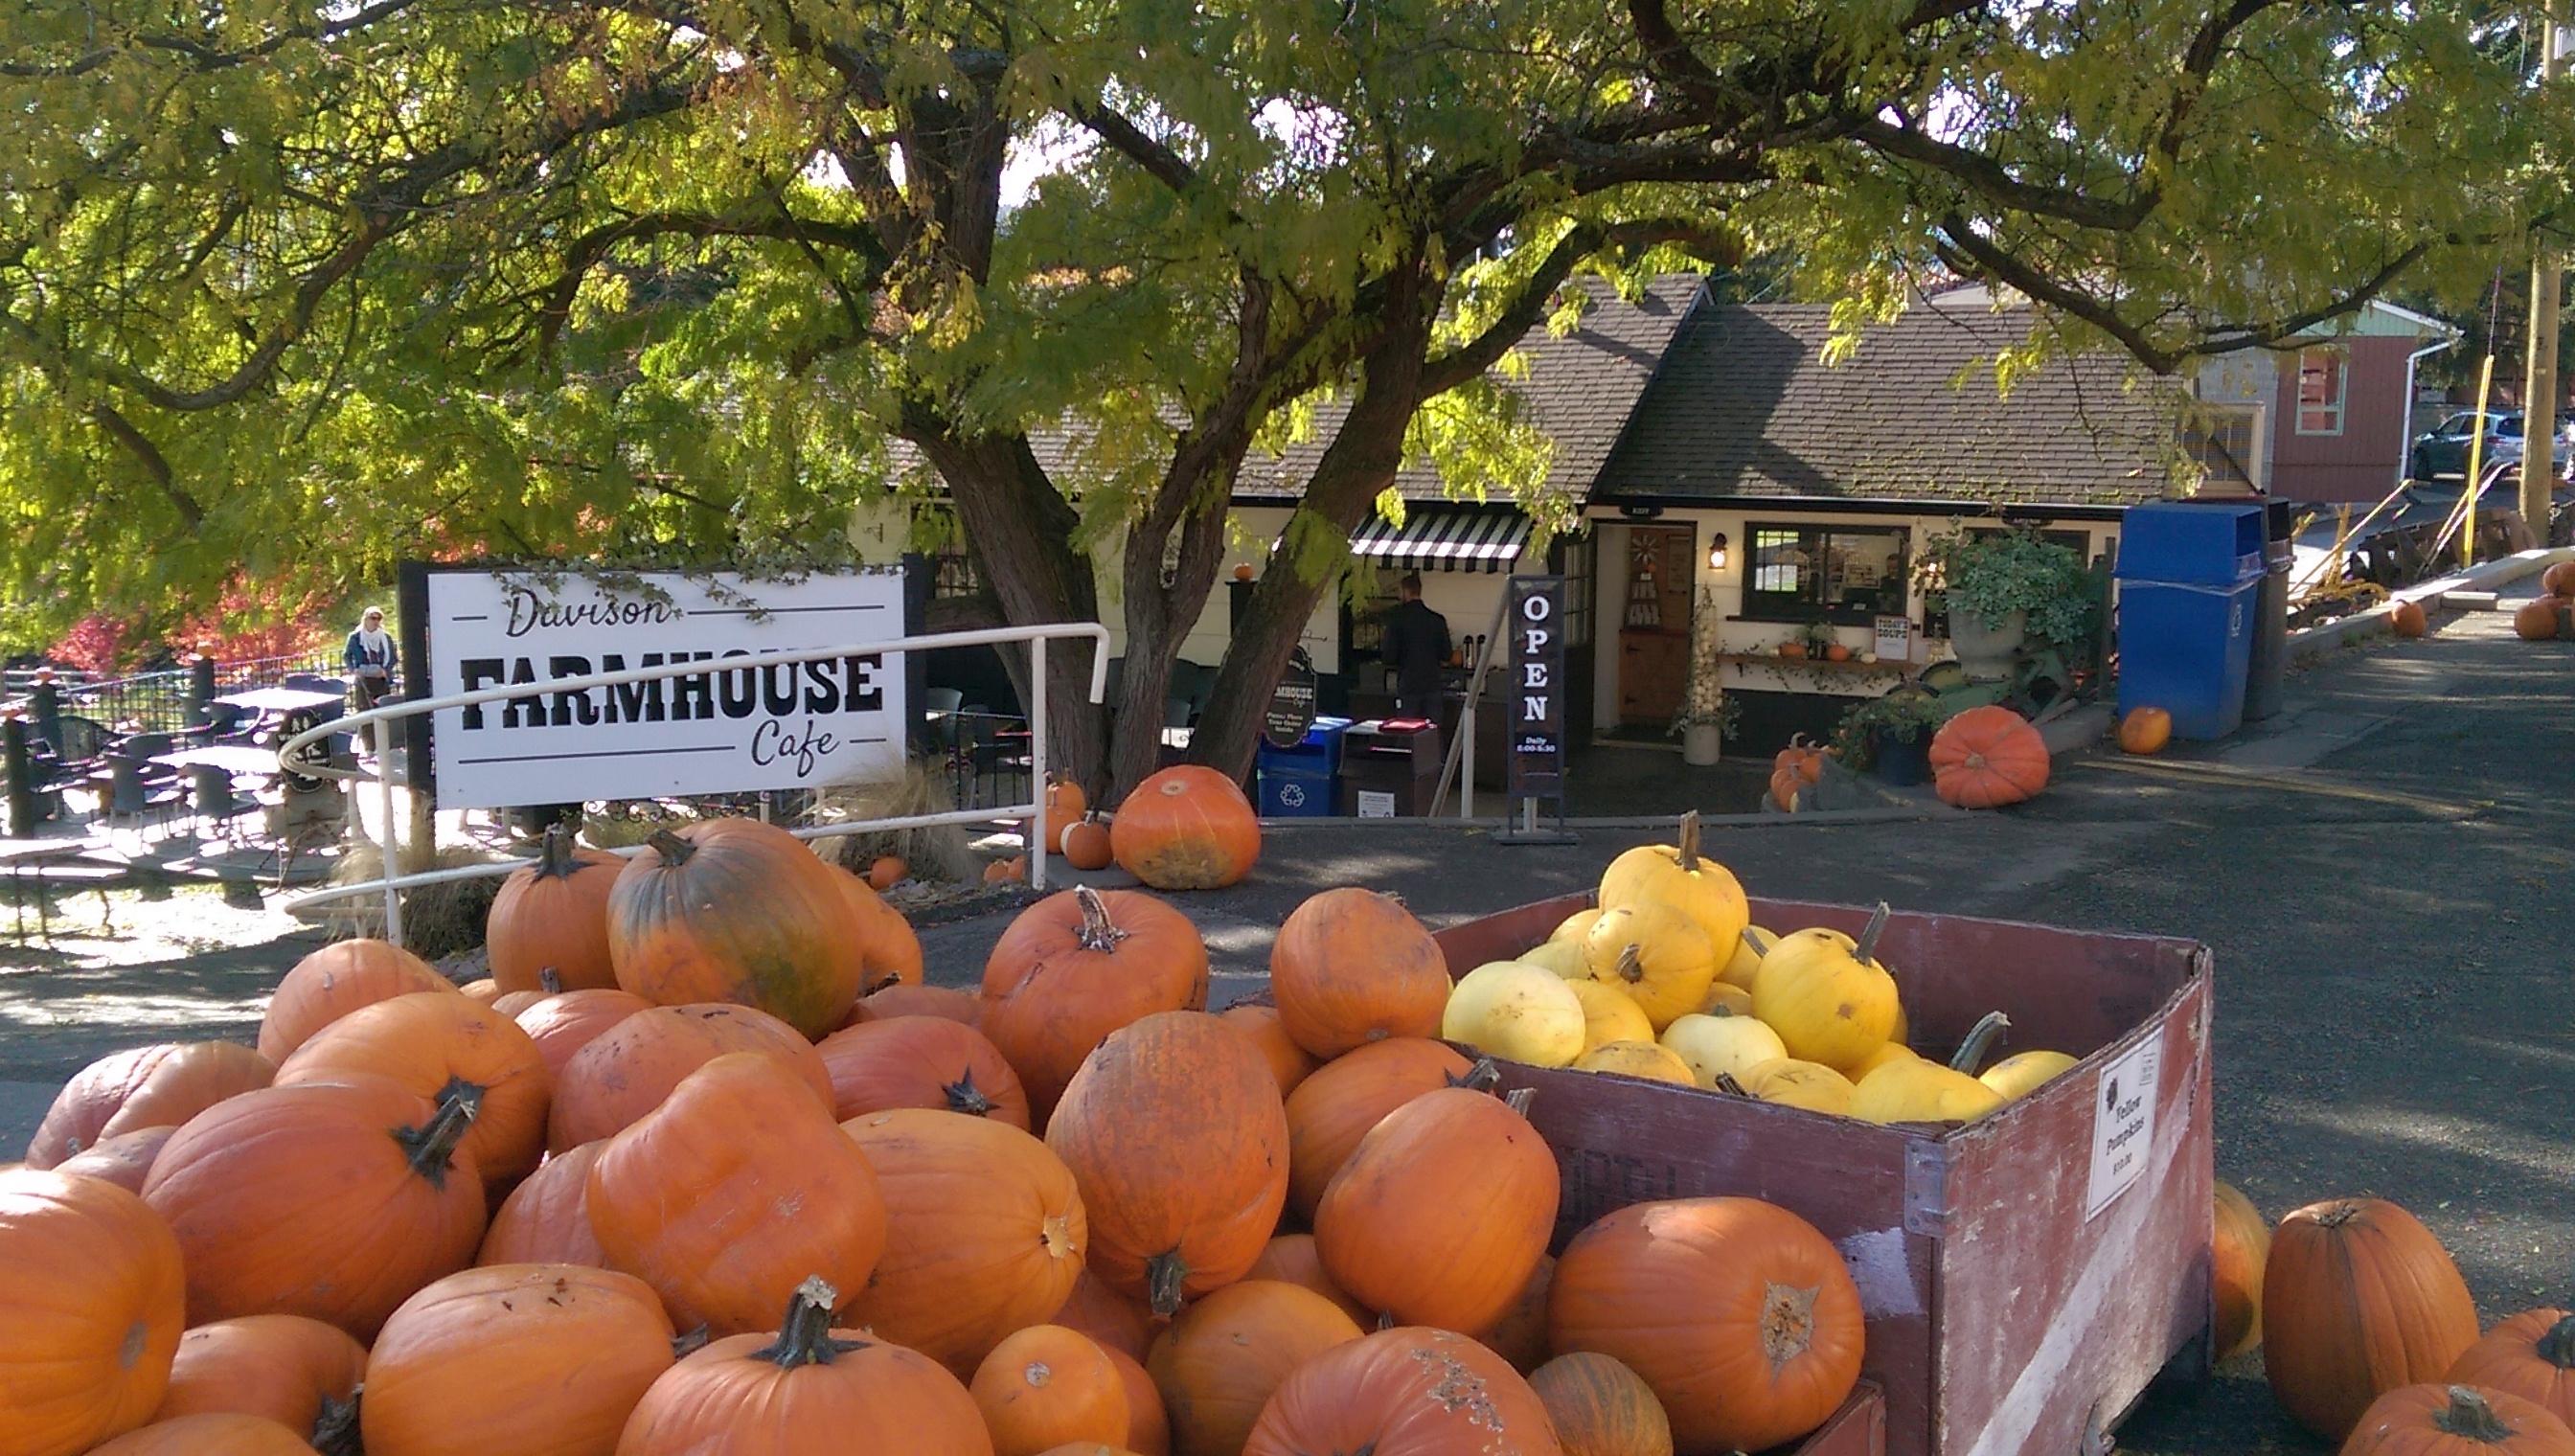 Davidson Orchards Farmhouse Cafe